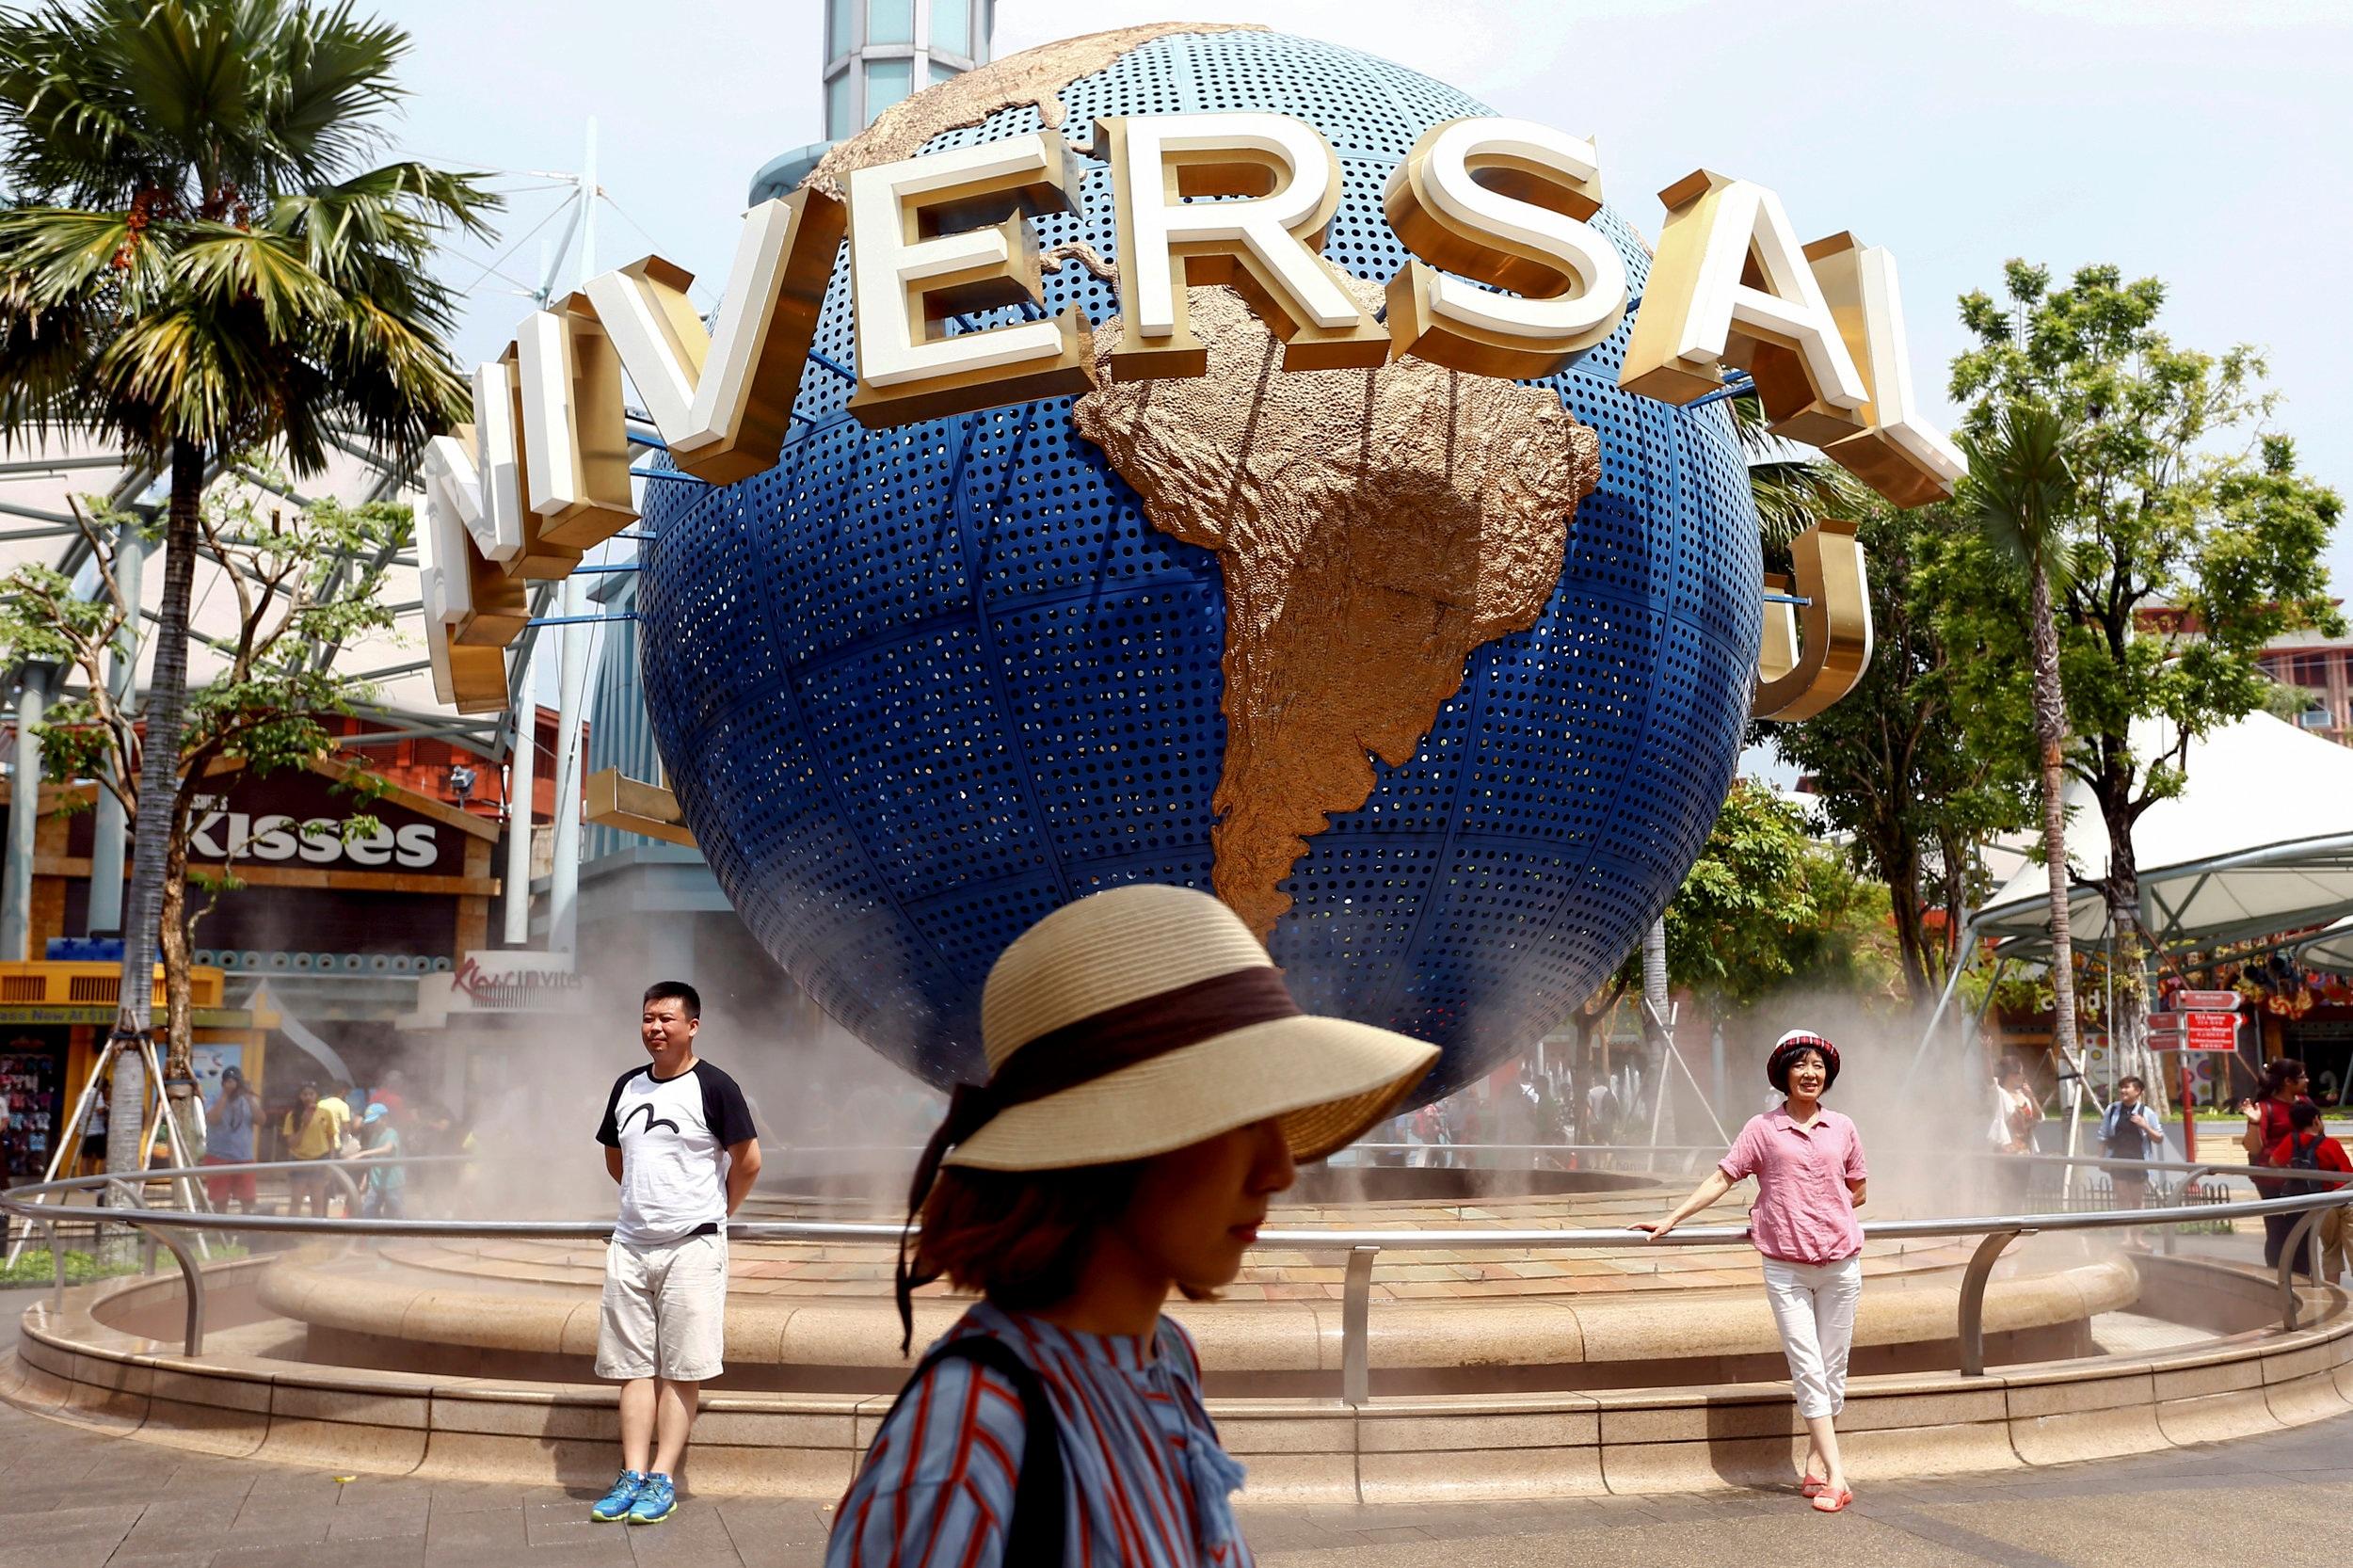 Tourists visit the Universal Studios in Sentosa, Singapore June 8, 2018. REUTERS/Feline Lim